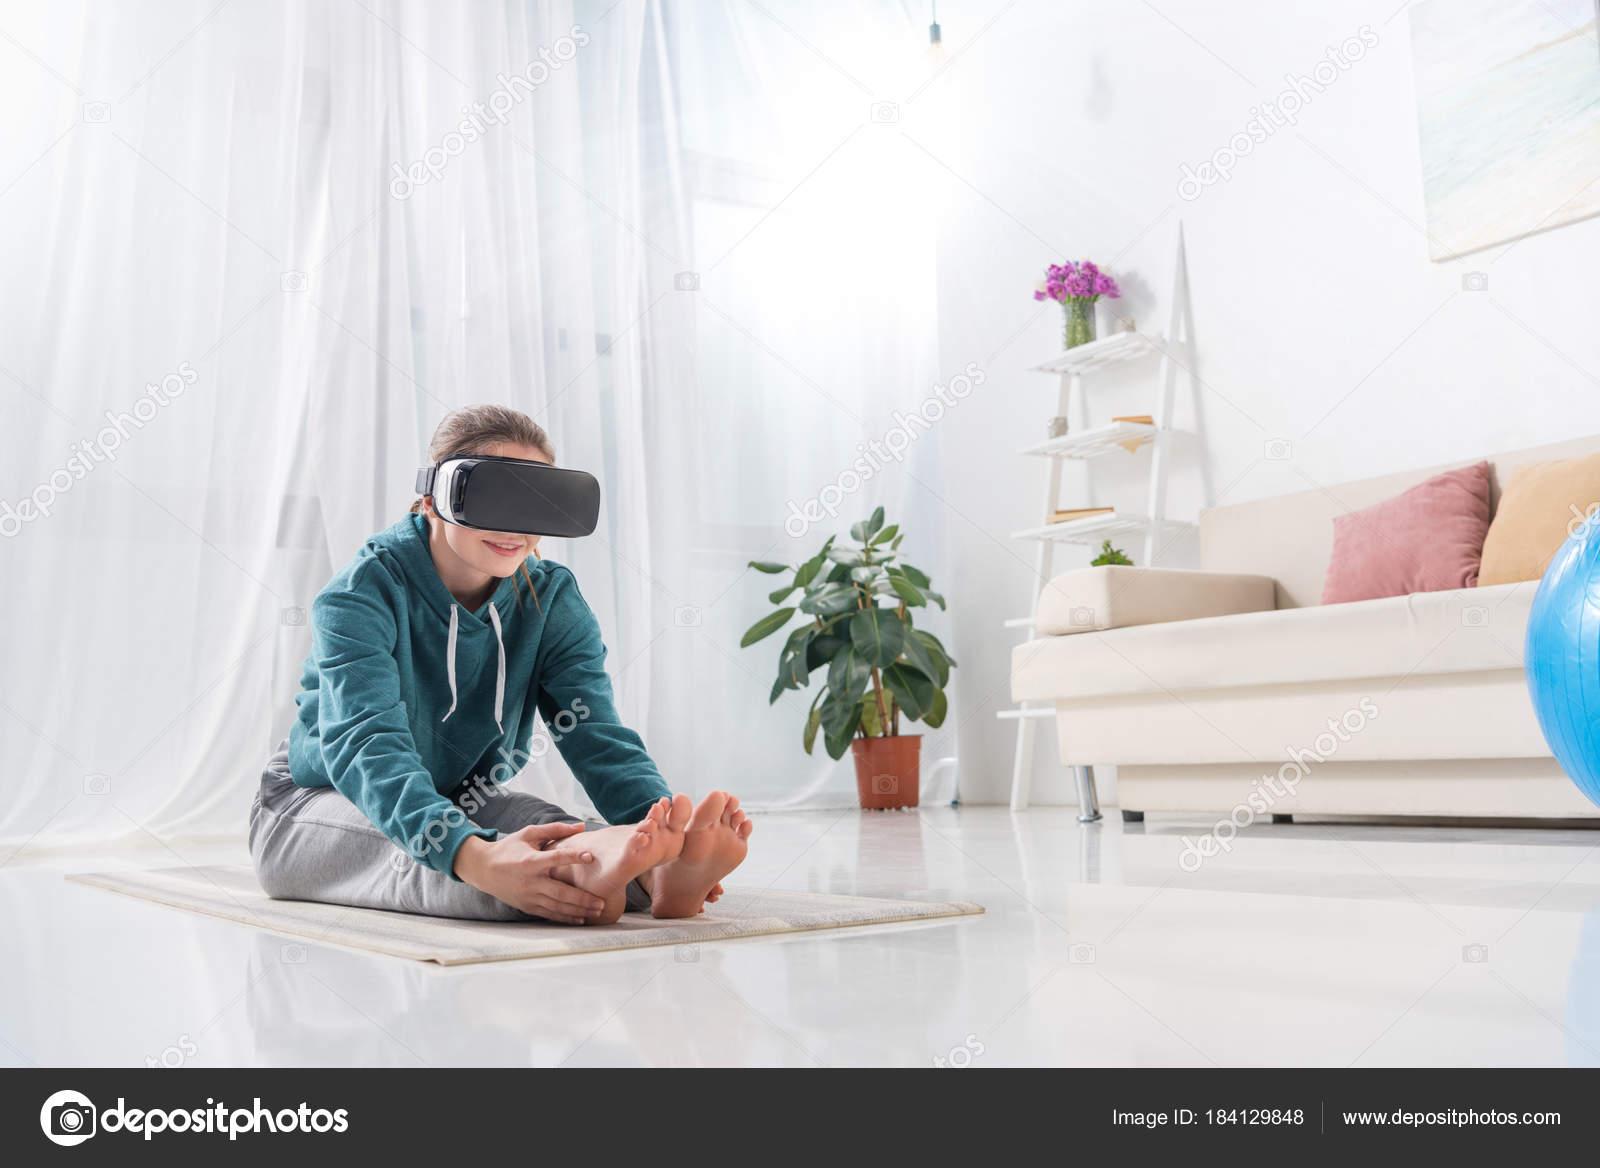 Girl Stretching Virtual Reality Headset Yoga Mat Home — Stock Photo ...